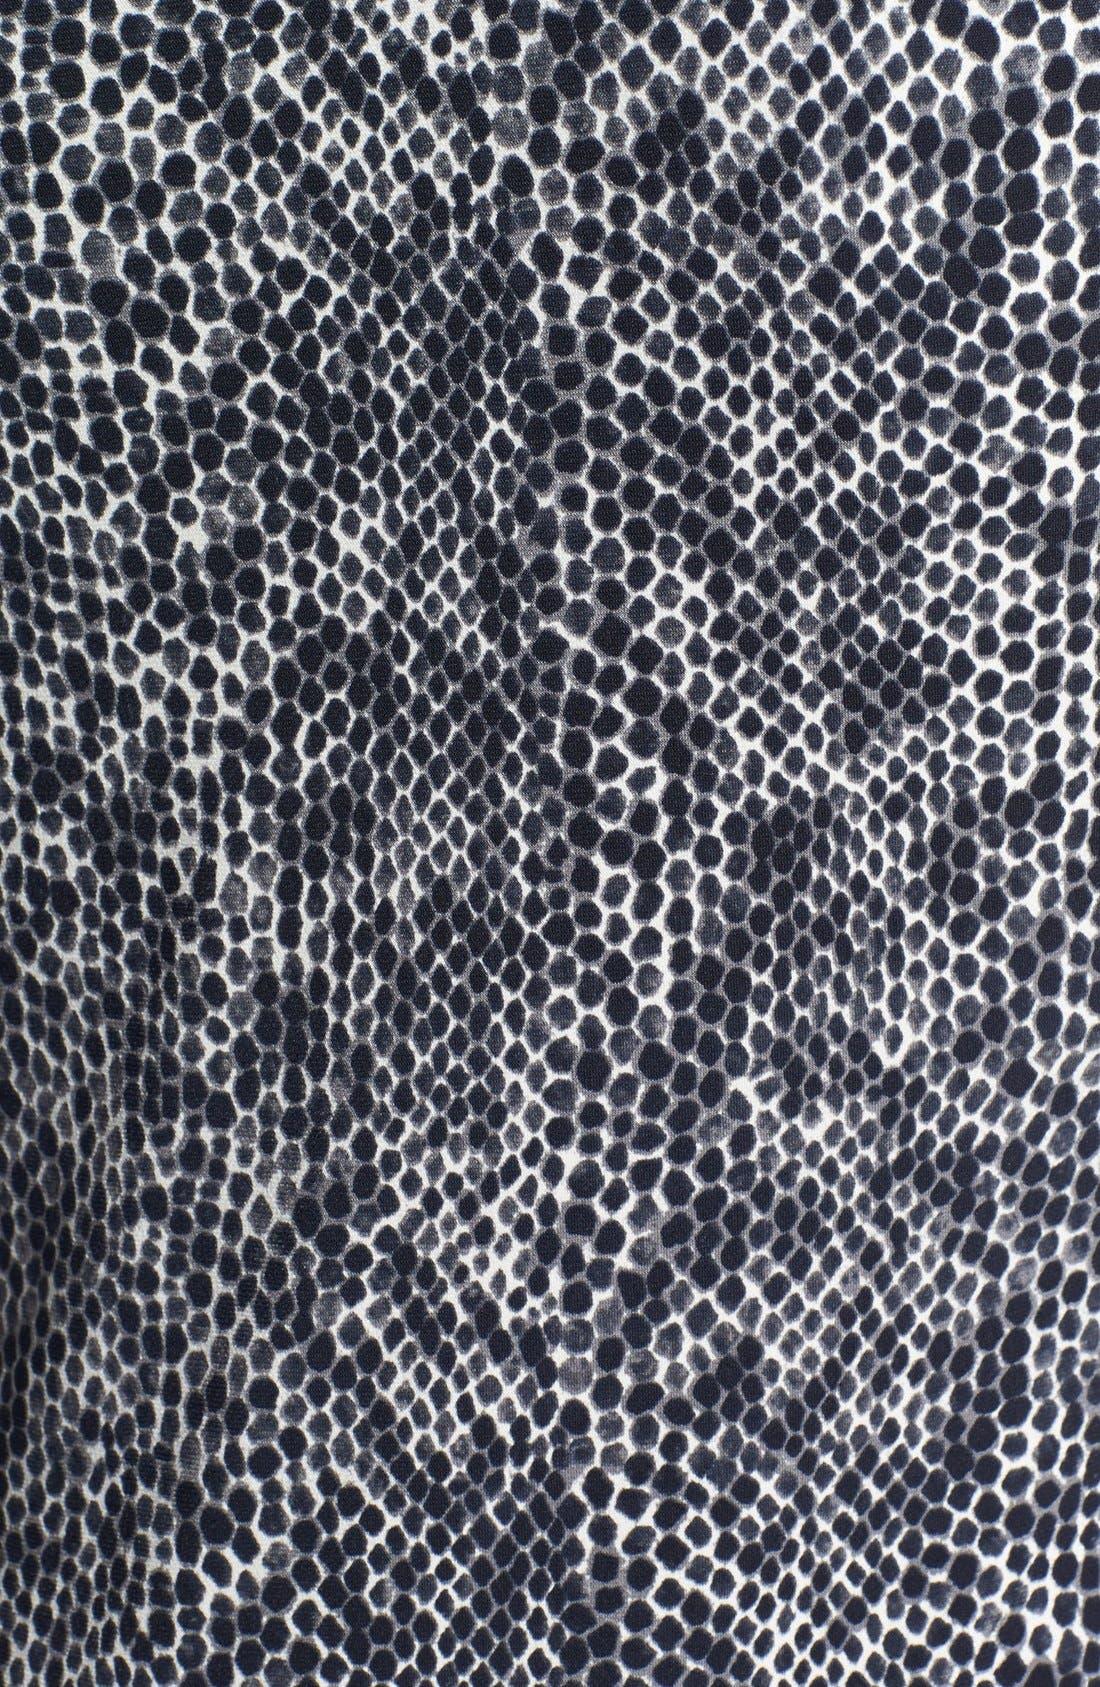 Alternate Image 3  - Vince Camuto 'Sea Snake' Sleeveless Stretch Knit Dress